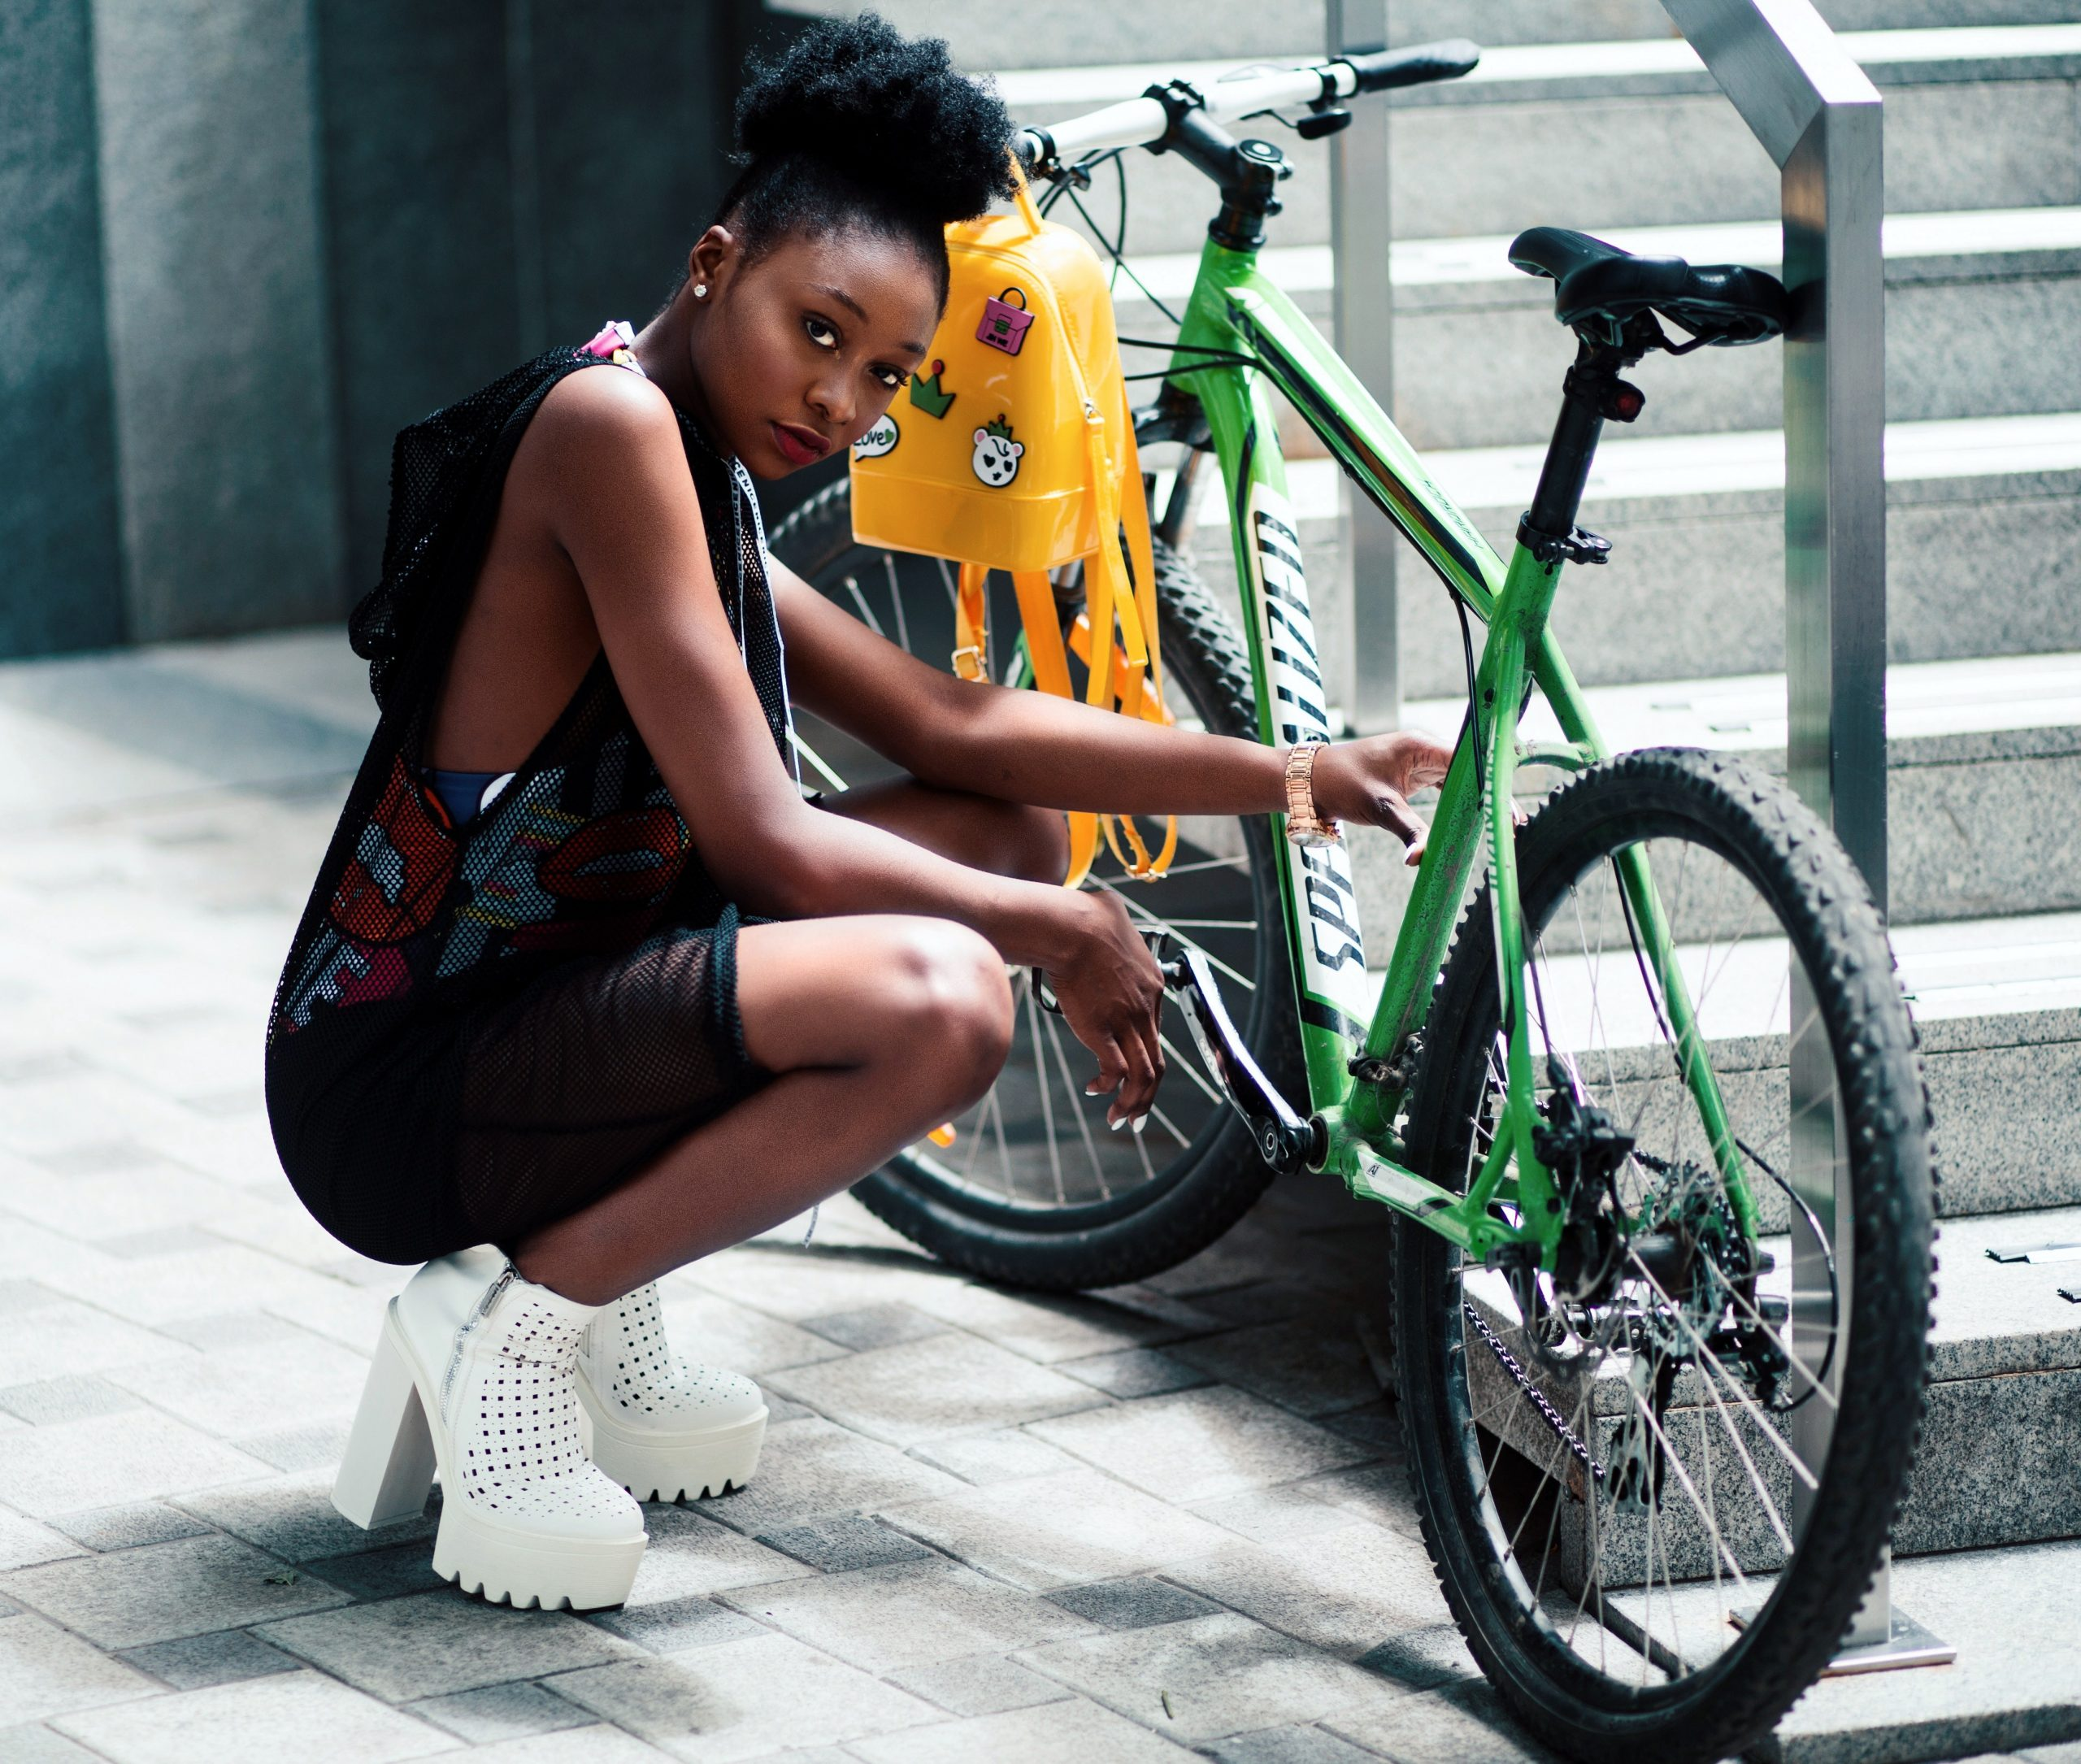 Business & Digital Marketing Plan for a Bike Lock Company